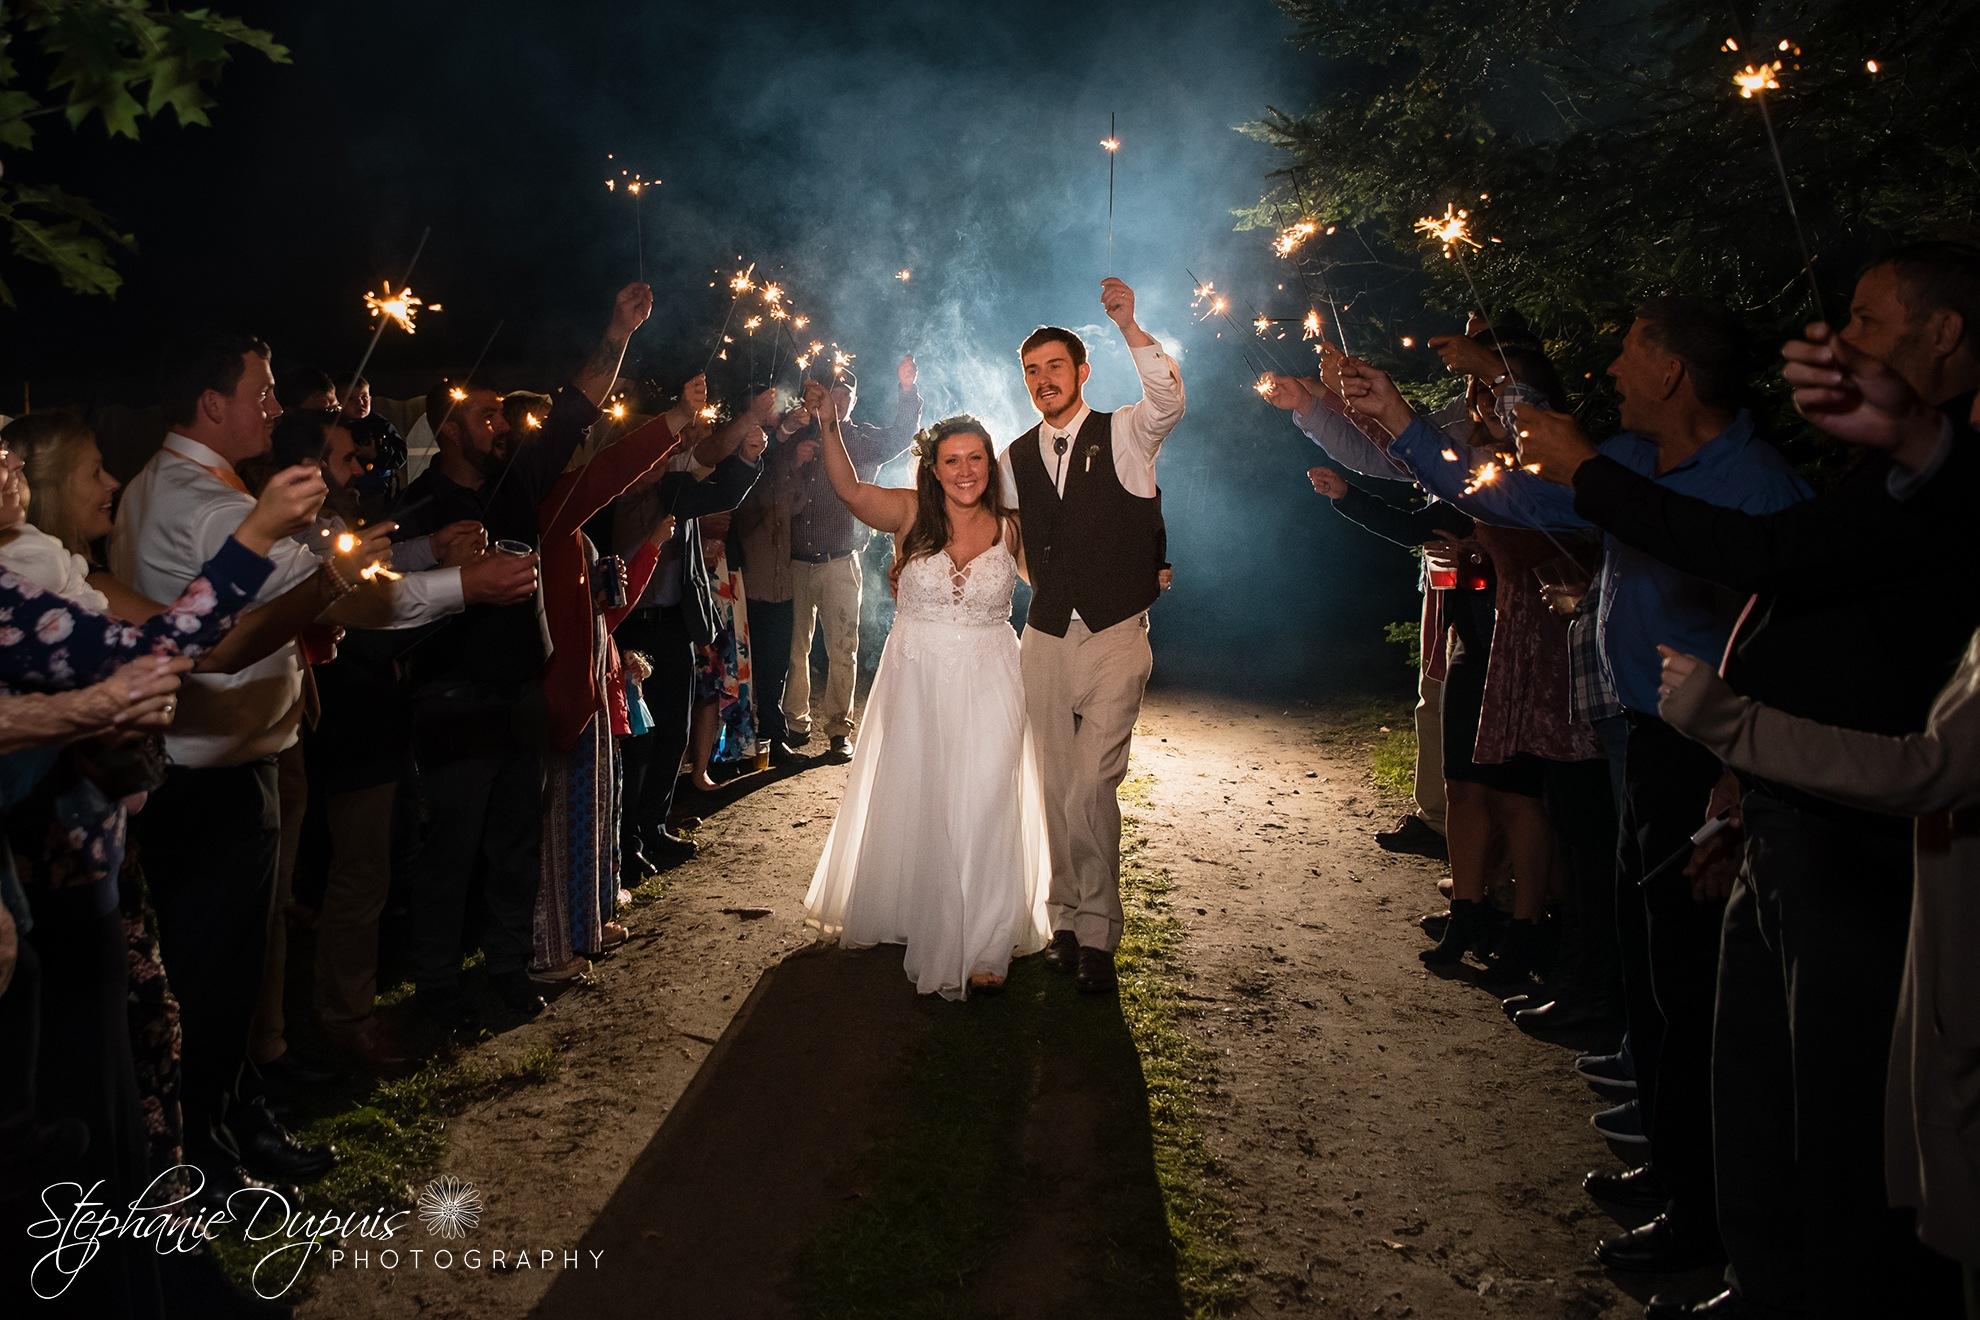 Hicks Wedding 21 - Portfolio: Hick's Wedding